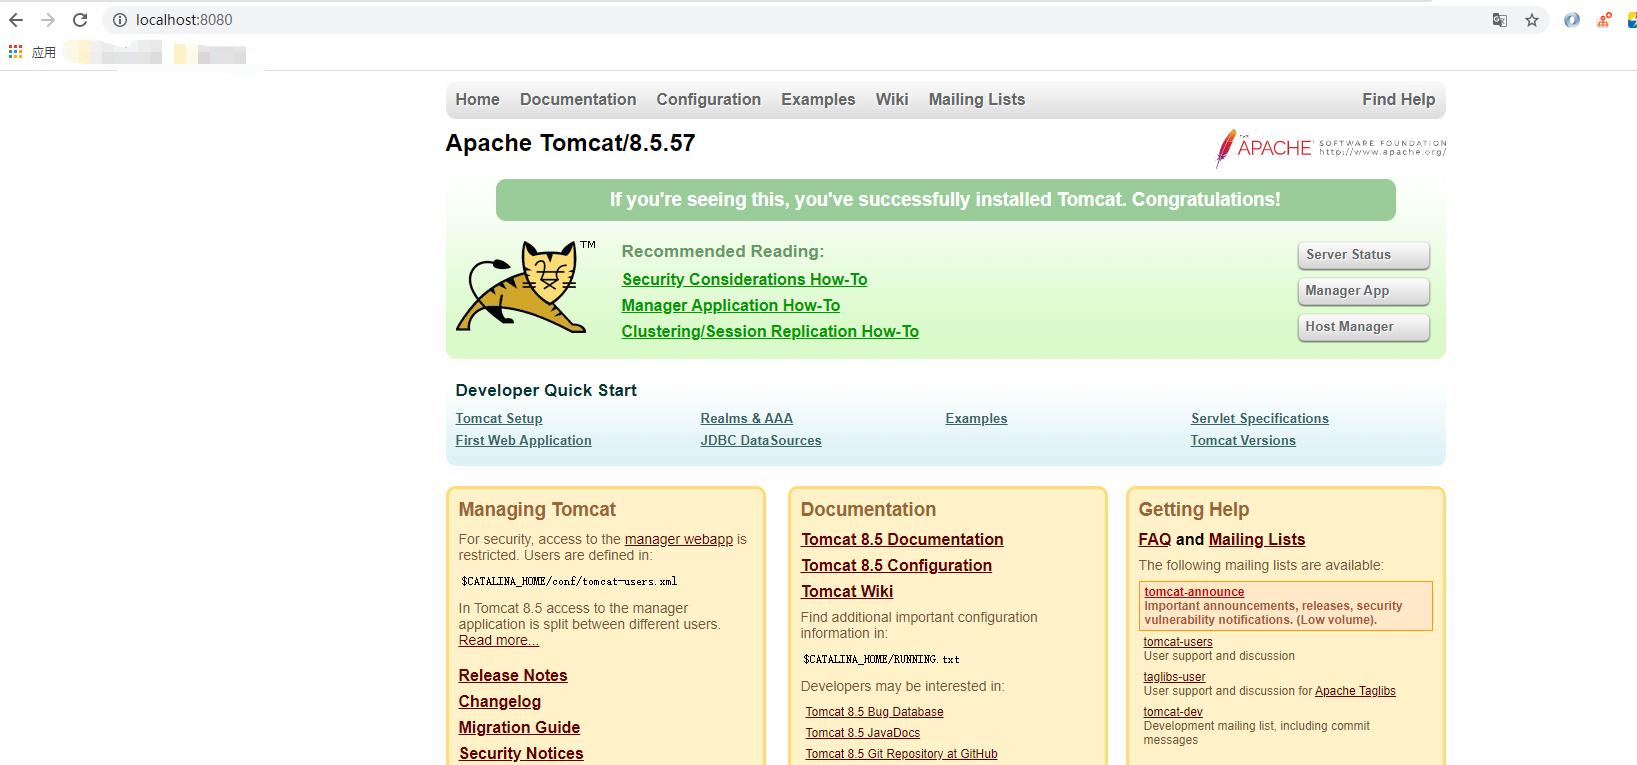 windows下安装jdk+tomcat+maven并配置